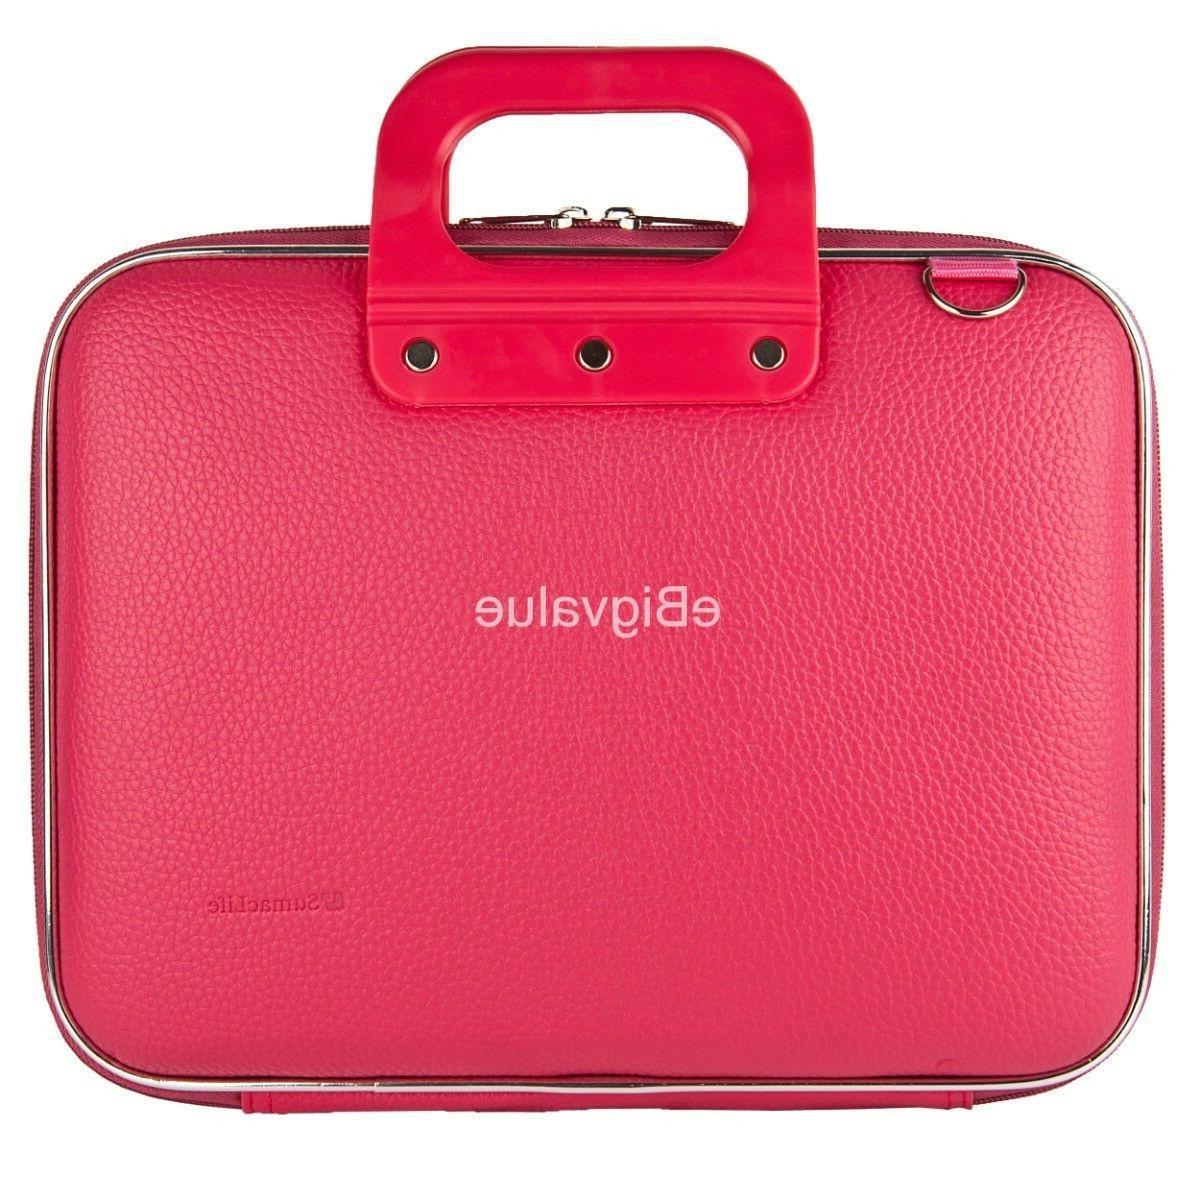 SumacLife Tablet Sleeve Case Messenger Bag for iPad Pro